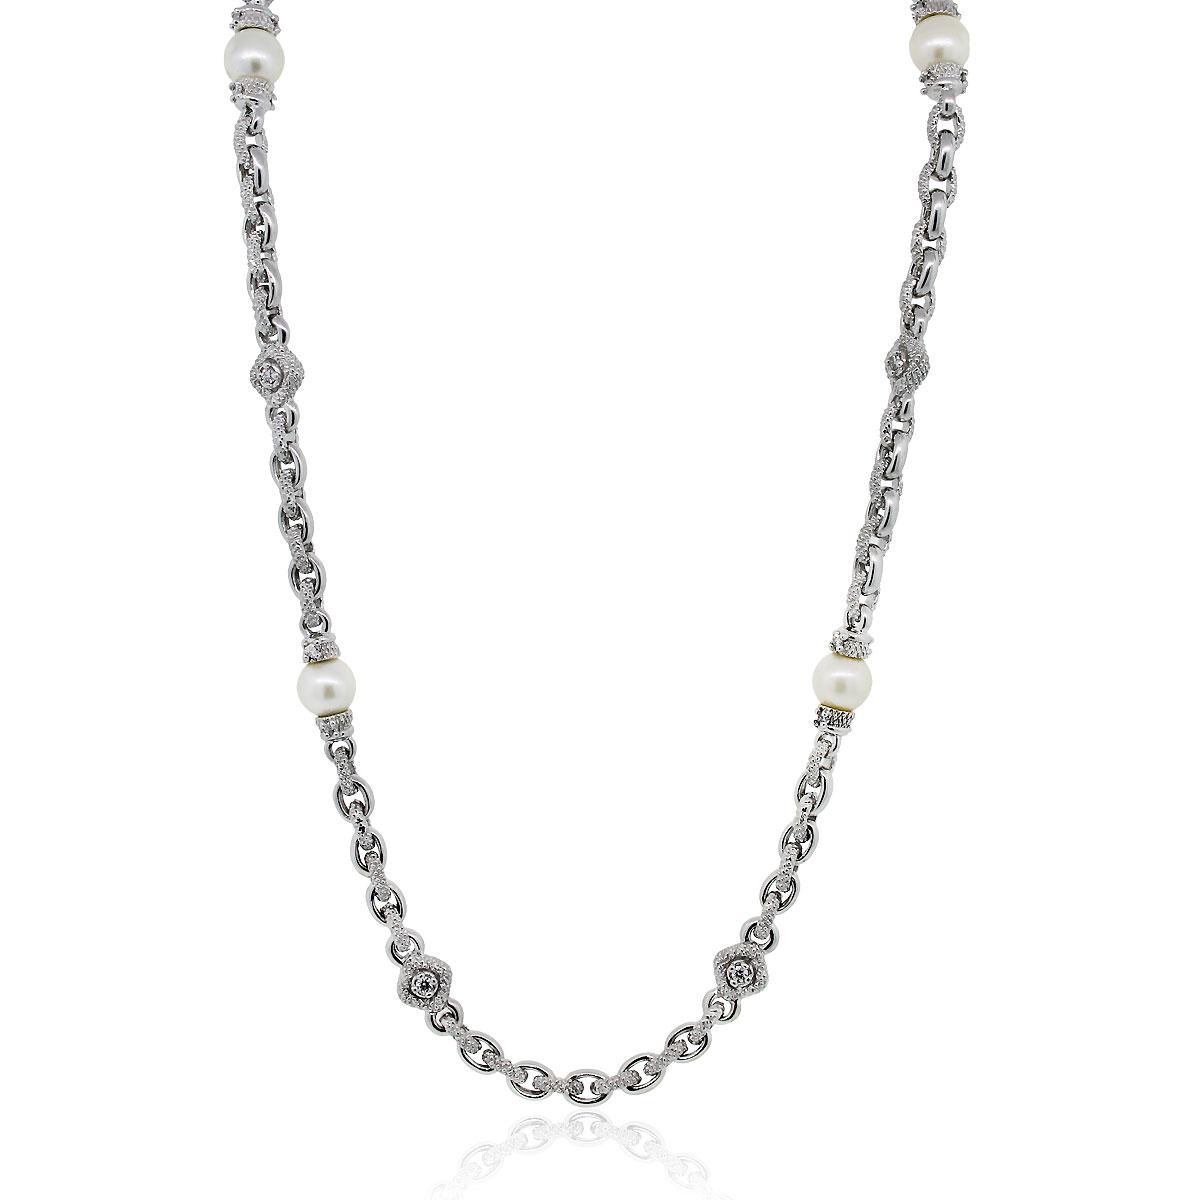 Judith Ripka 18k White Gold Diamond Amp Pearl Necklace